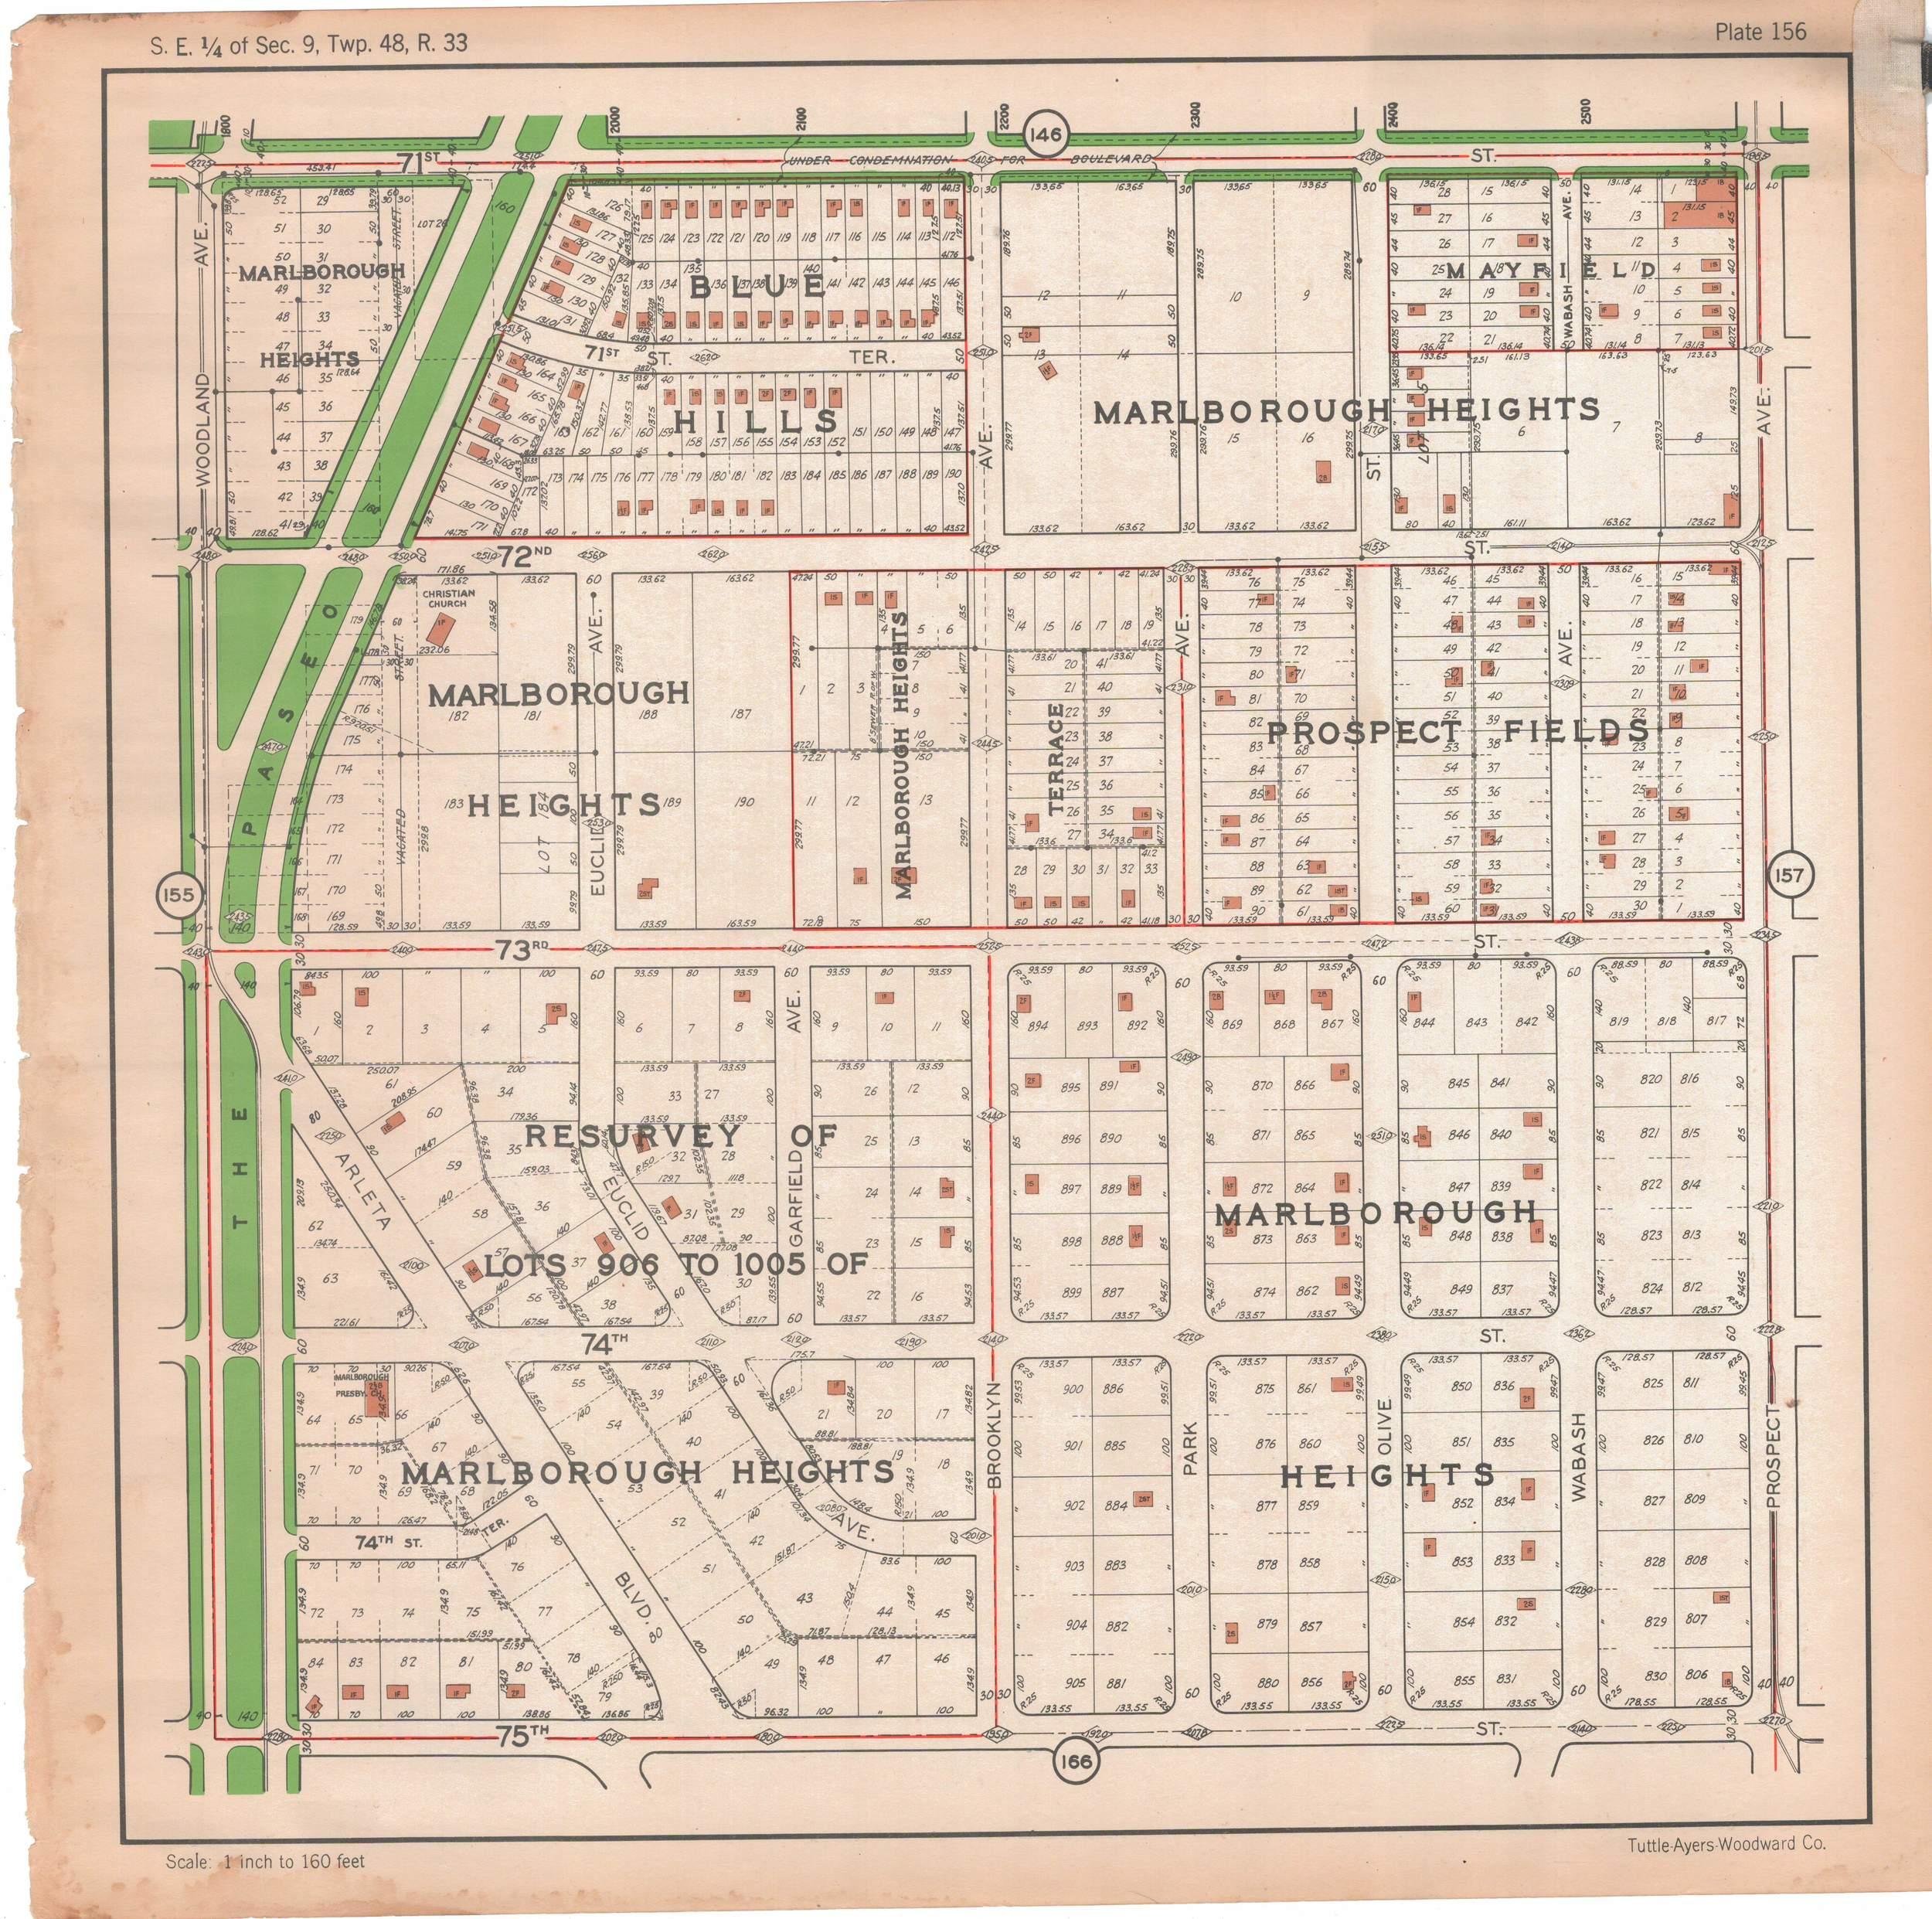 1925 TUTTLE_AYERS_Plate_156.JPG